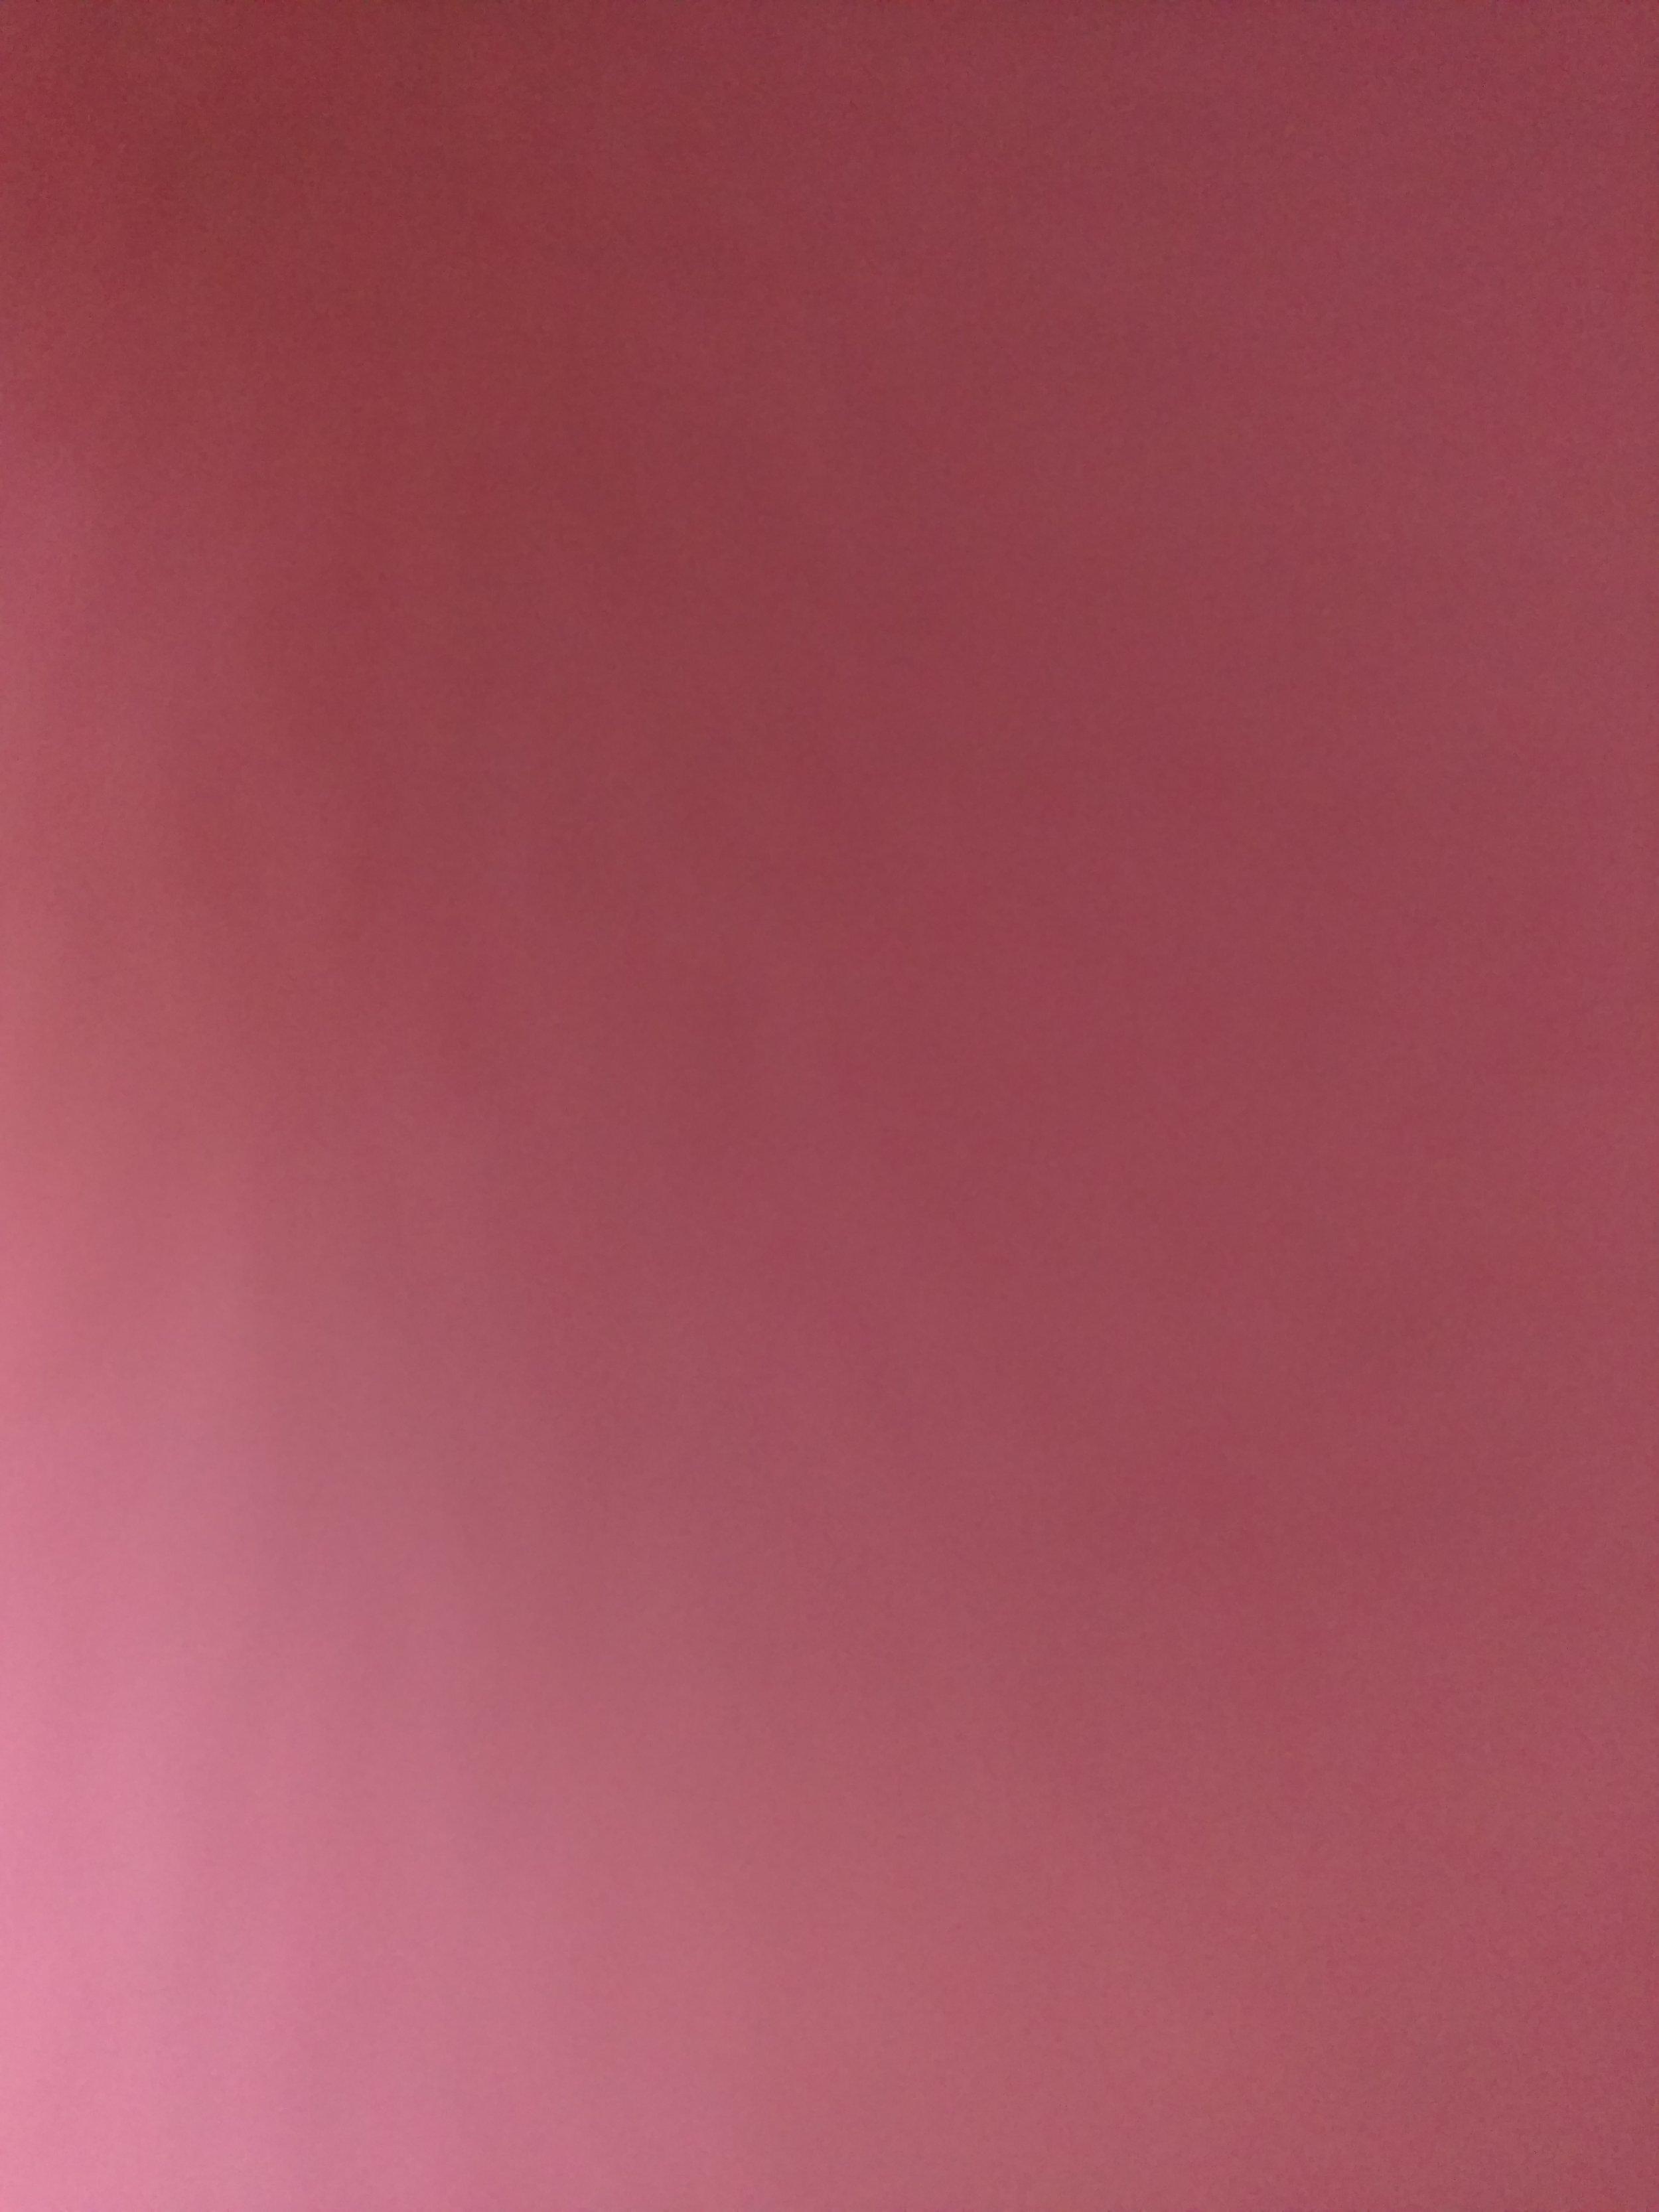 willroth-co-free-texture-gradient-091.jpg